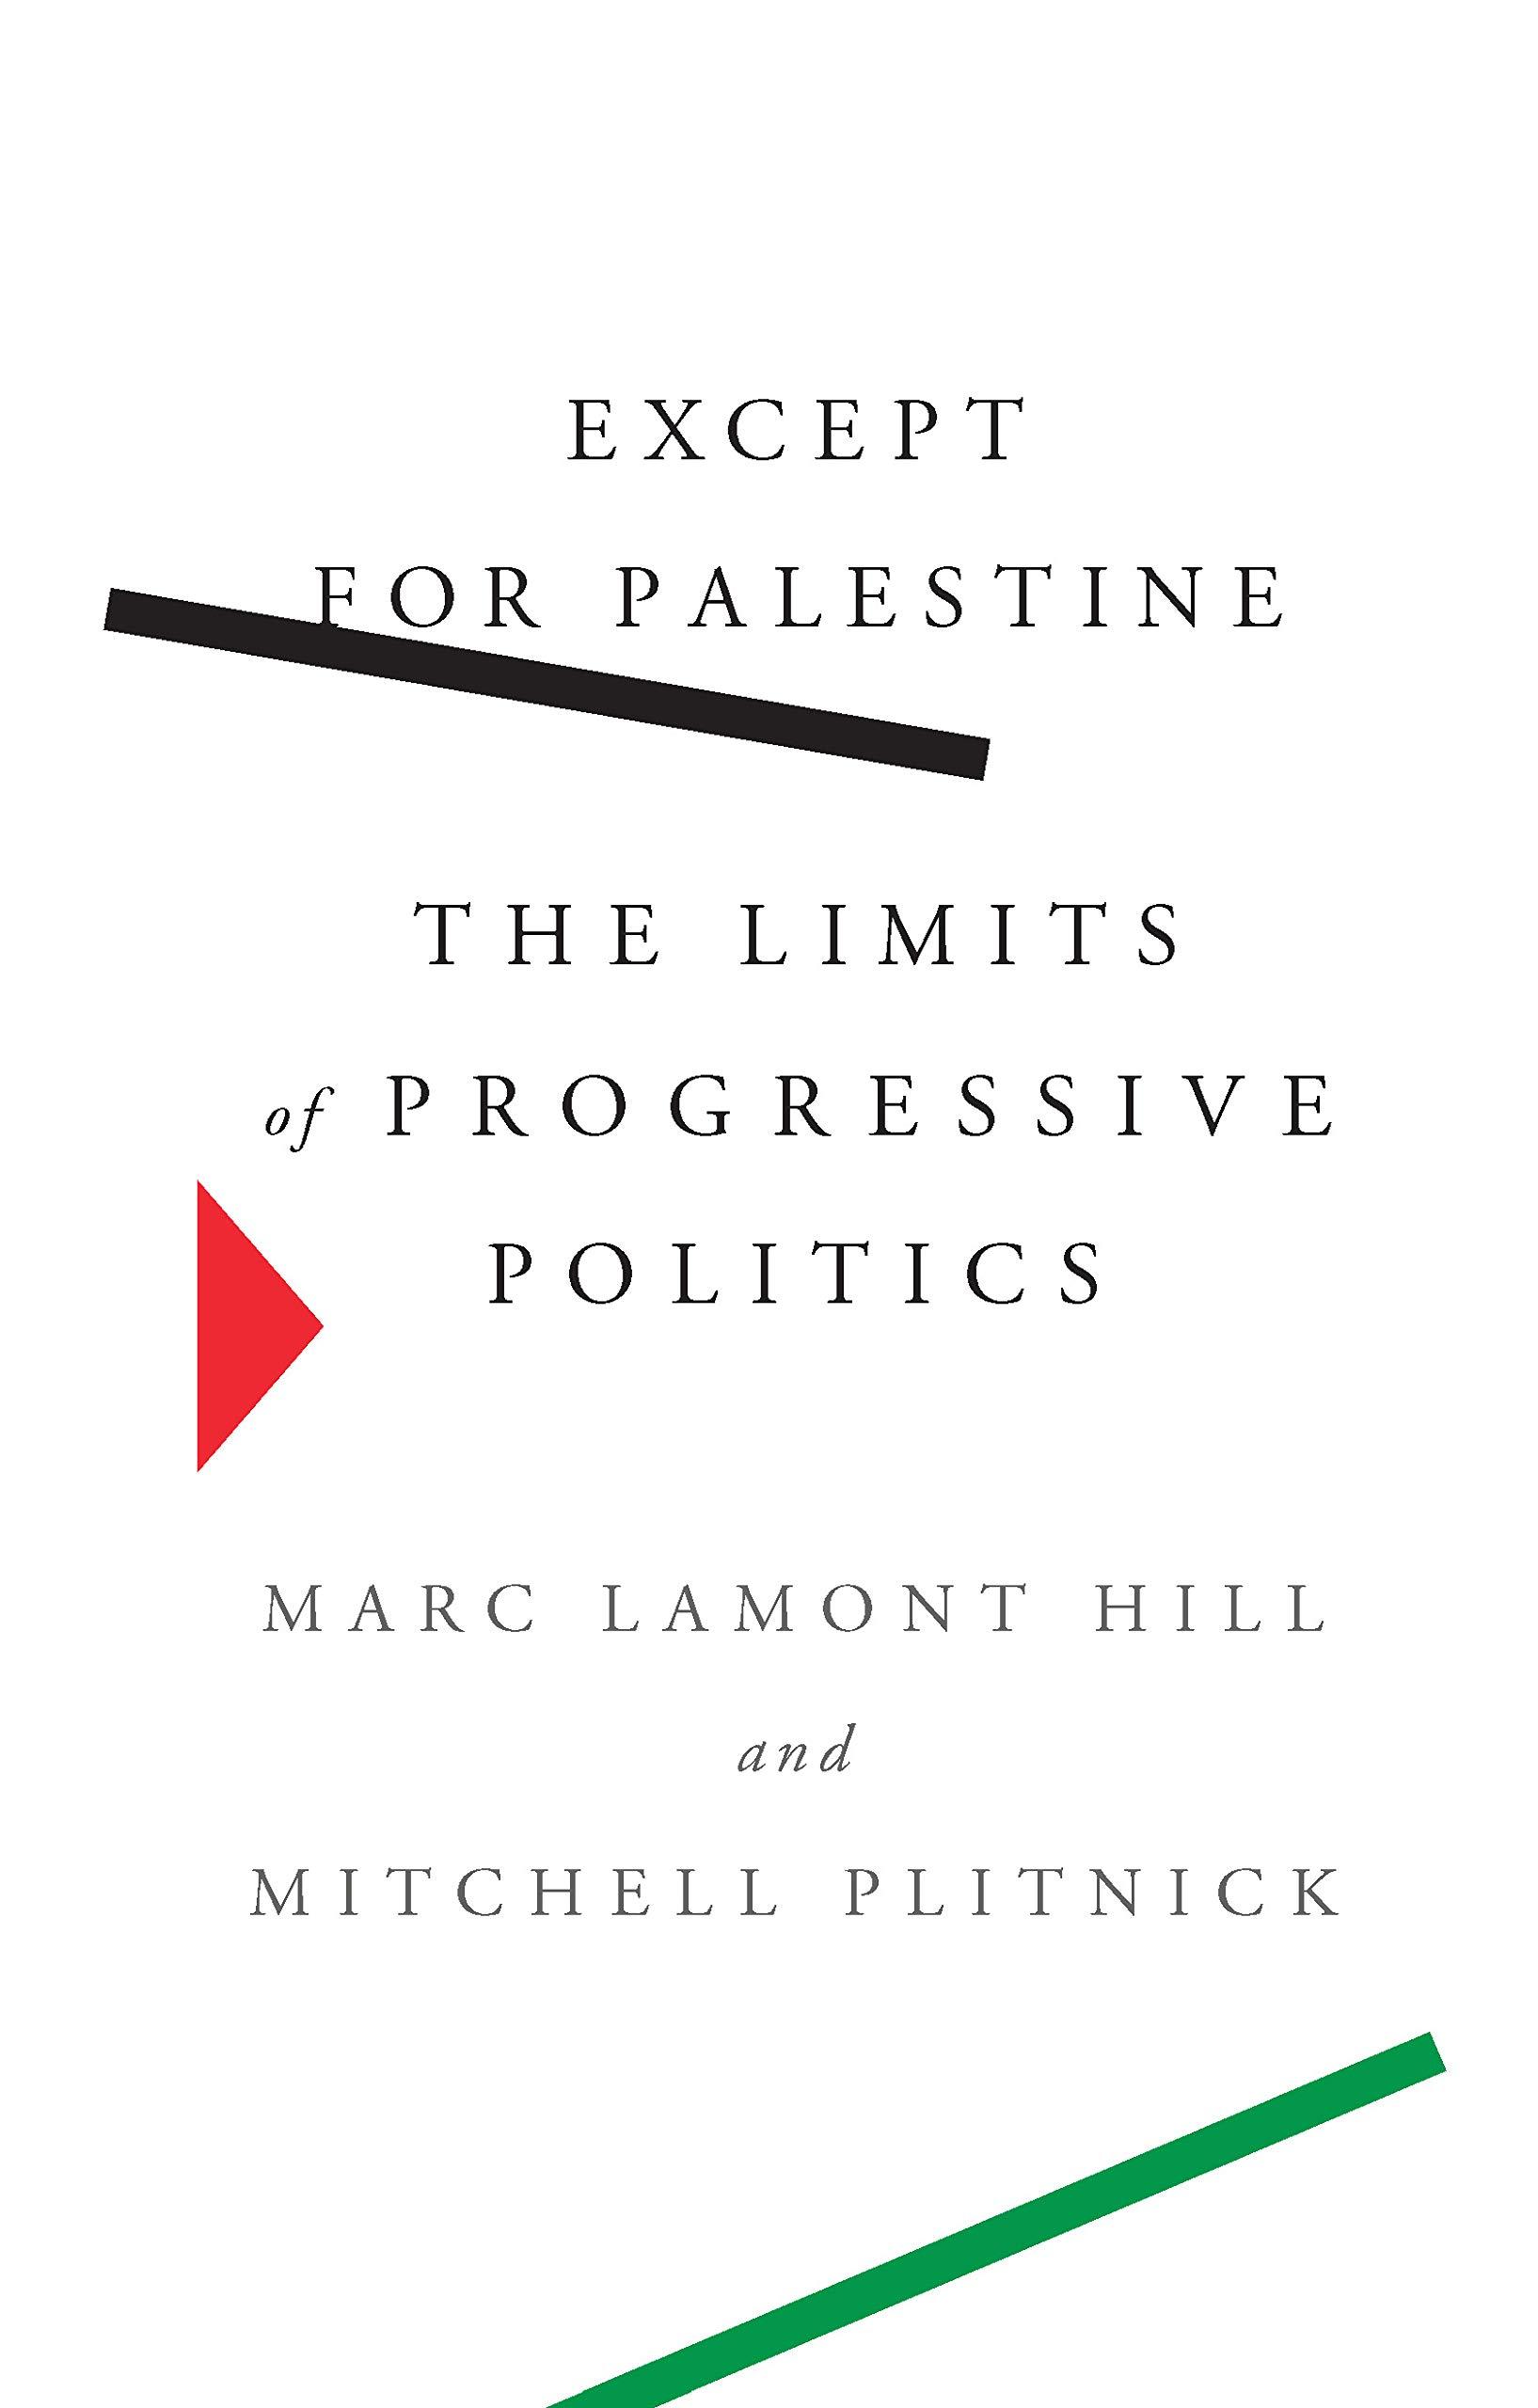 Except for Palestine: The Limits of Progressive Politics: Amazon.co.uk: Hill,  Marc Lamont, Plitnick, Mitchell: 9781620975923: Books